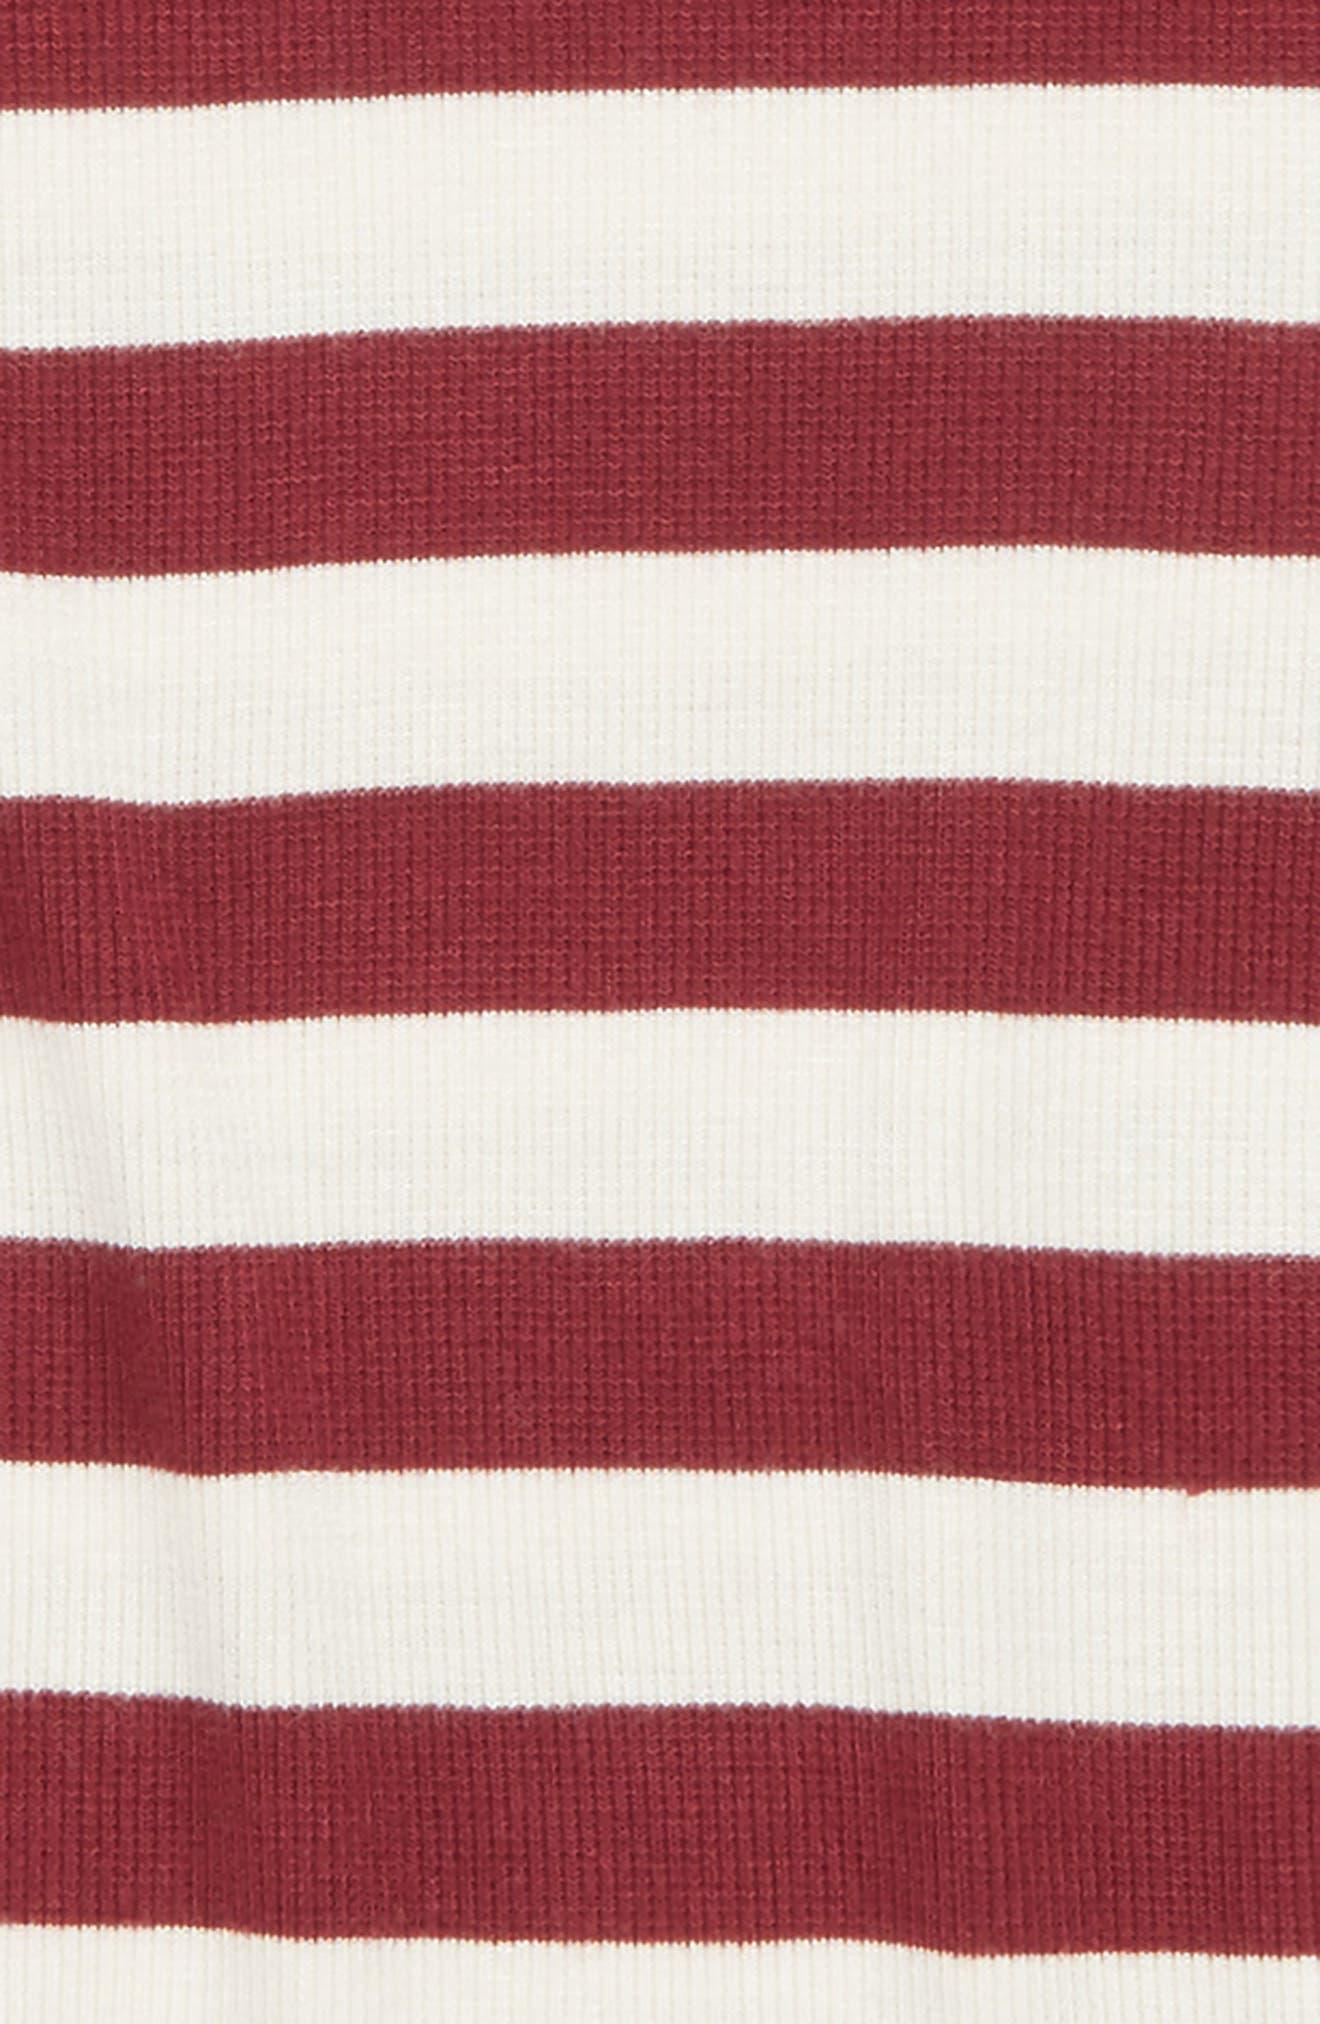 Stripe Knit Tee,                             Alternate thumbnail 2, color,                             Red Cordovan- Ivory Stripe